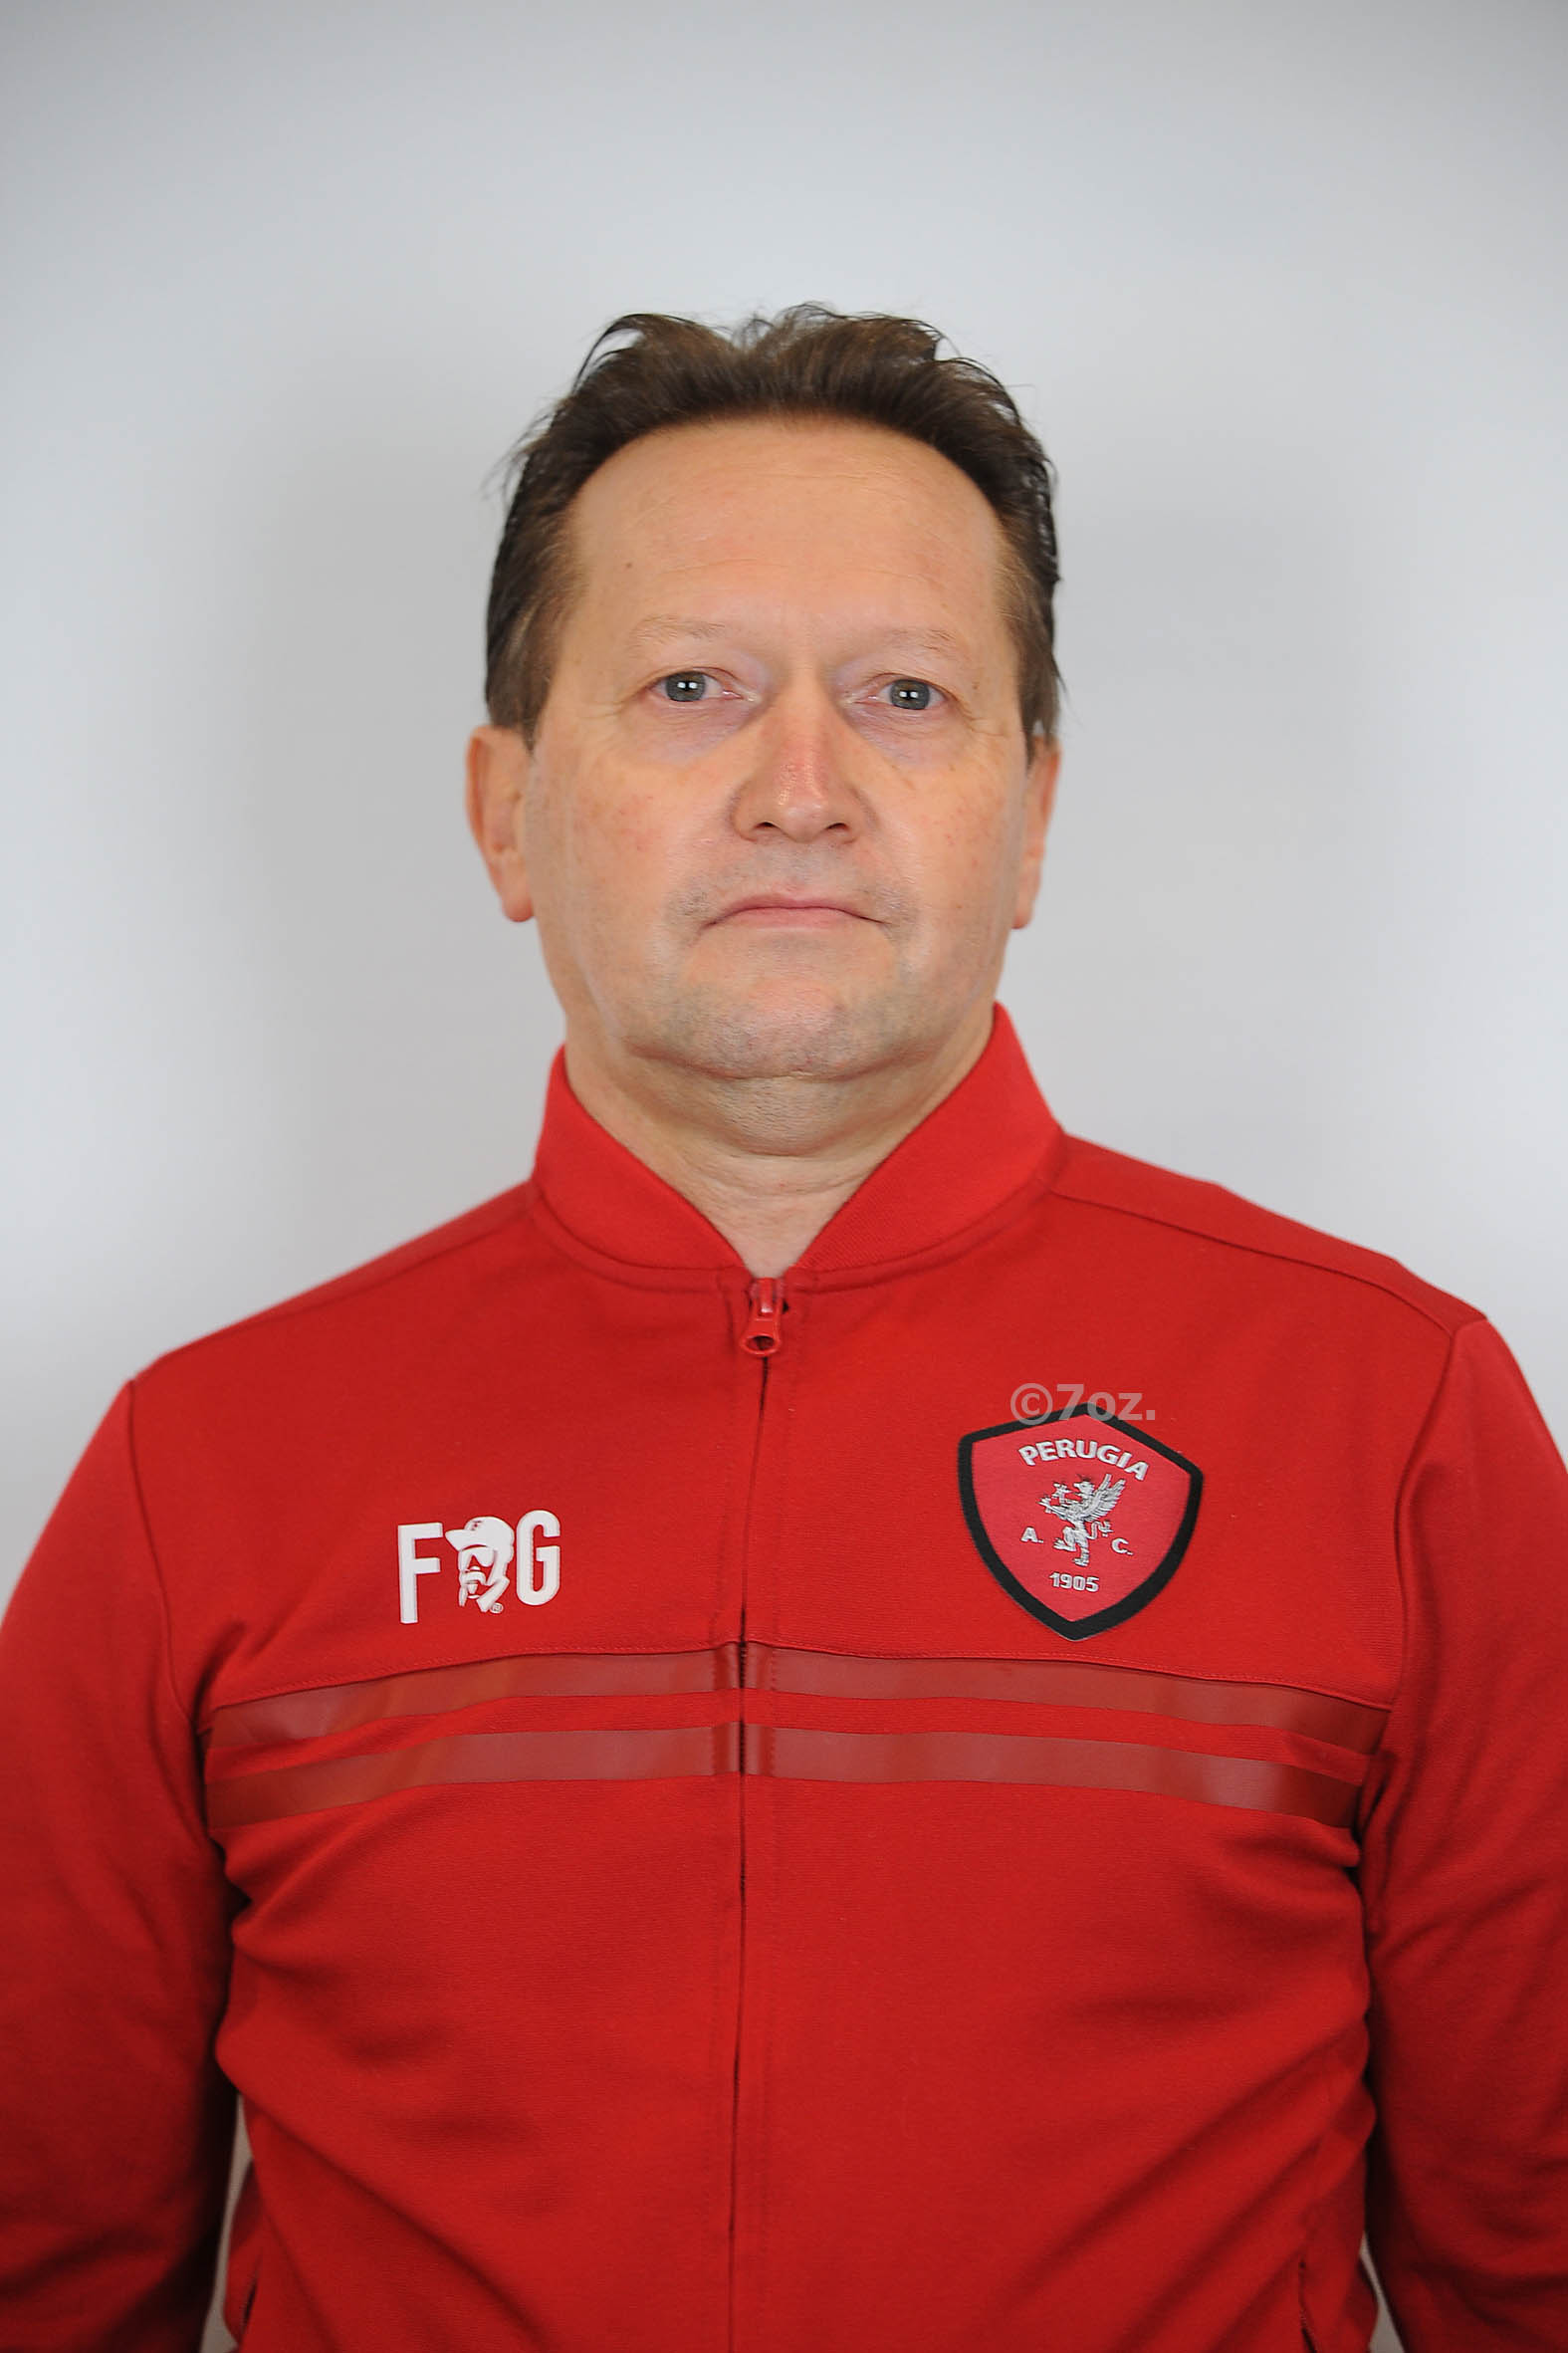 Antonello Viola- A.C. Perugia Calcio